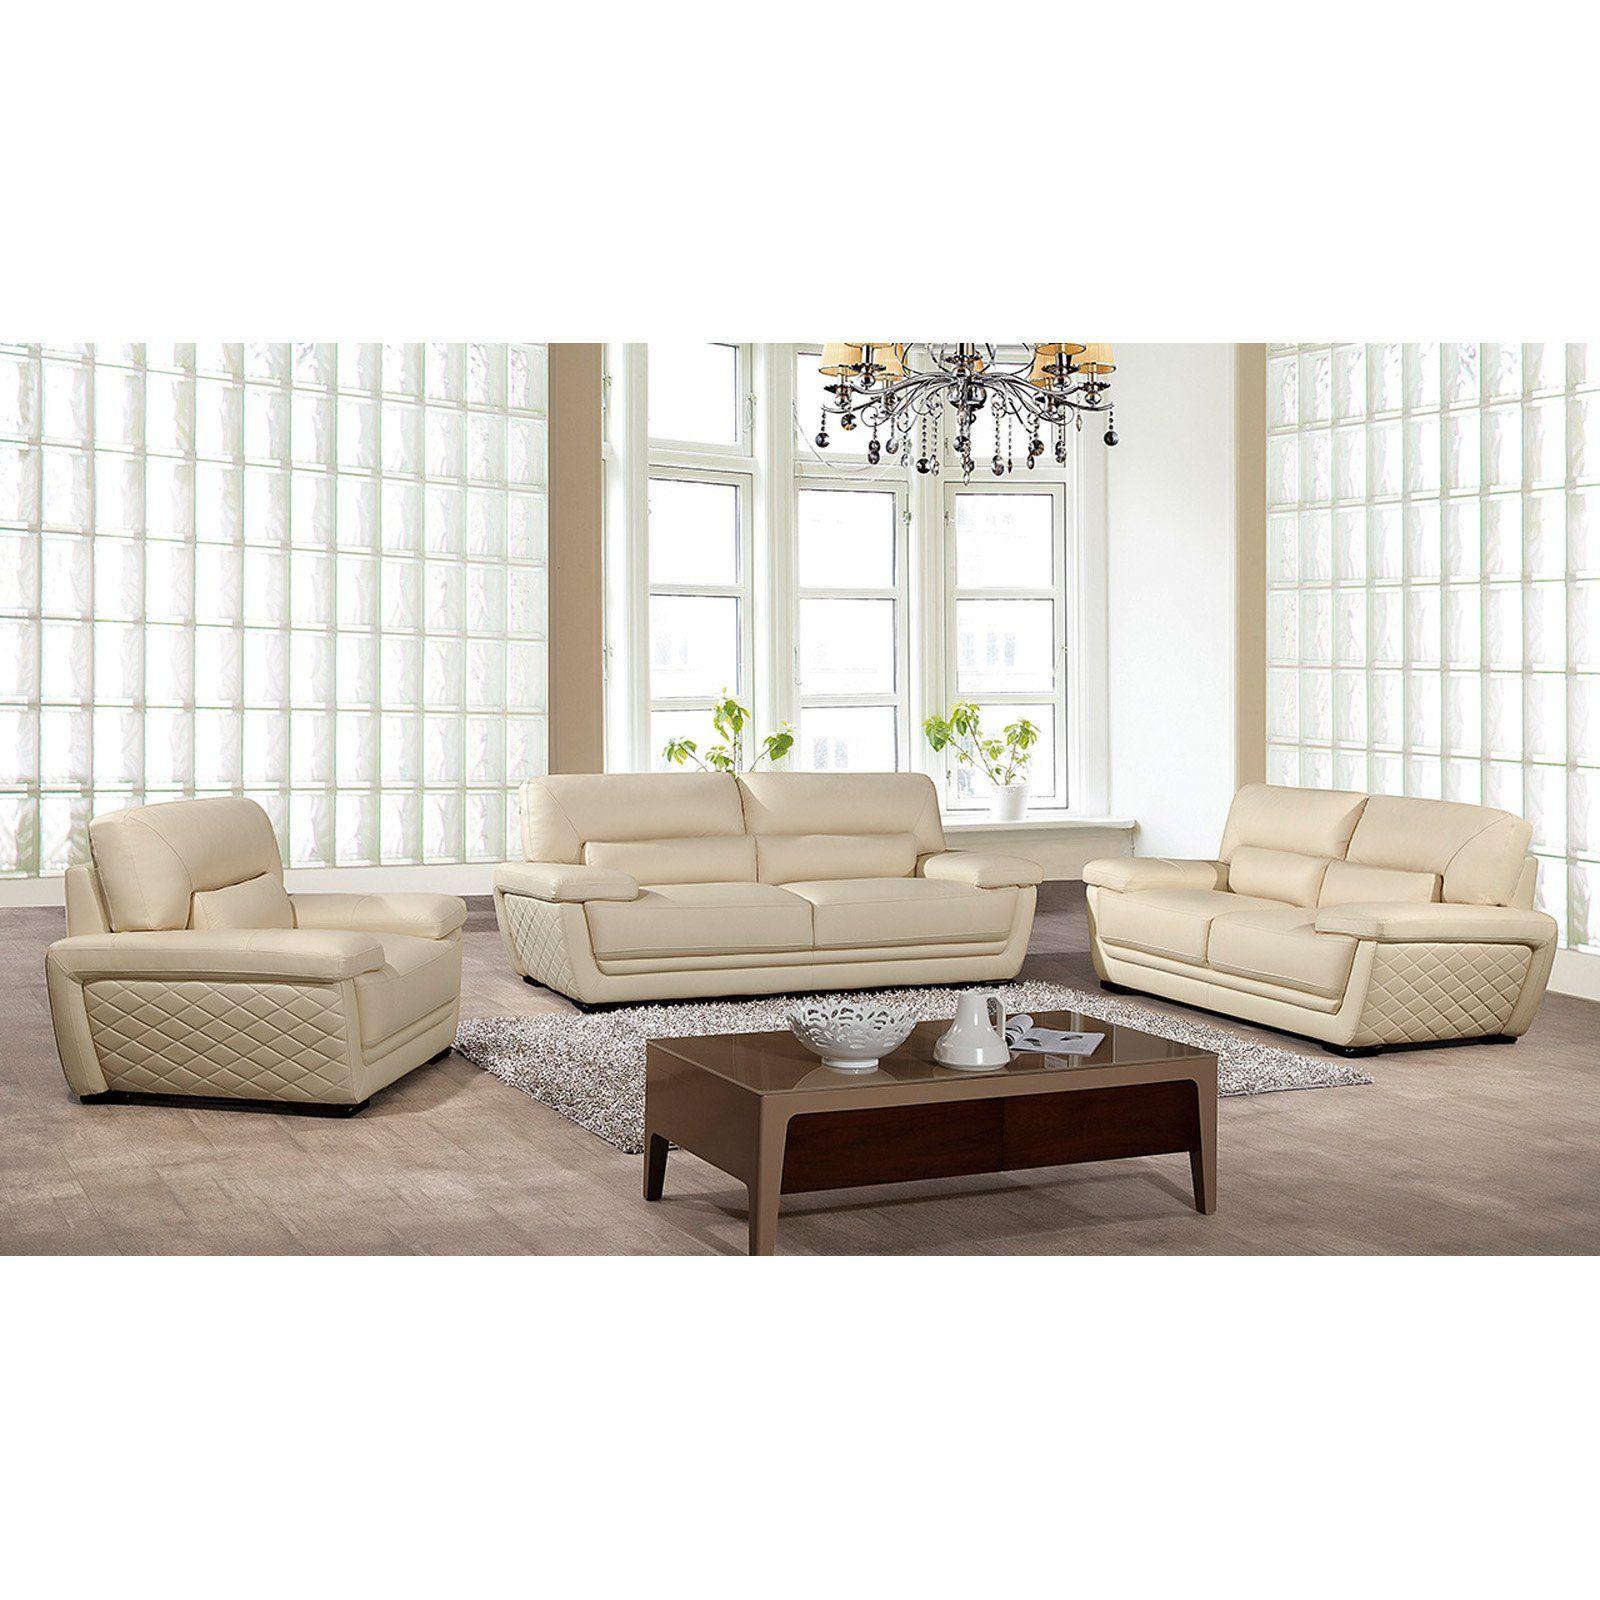 american eagle furniture emma 3 piece sofa set ek019 crm rh za pinterest com